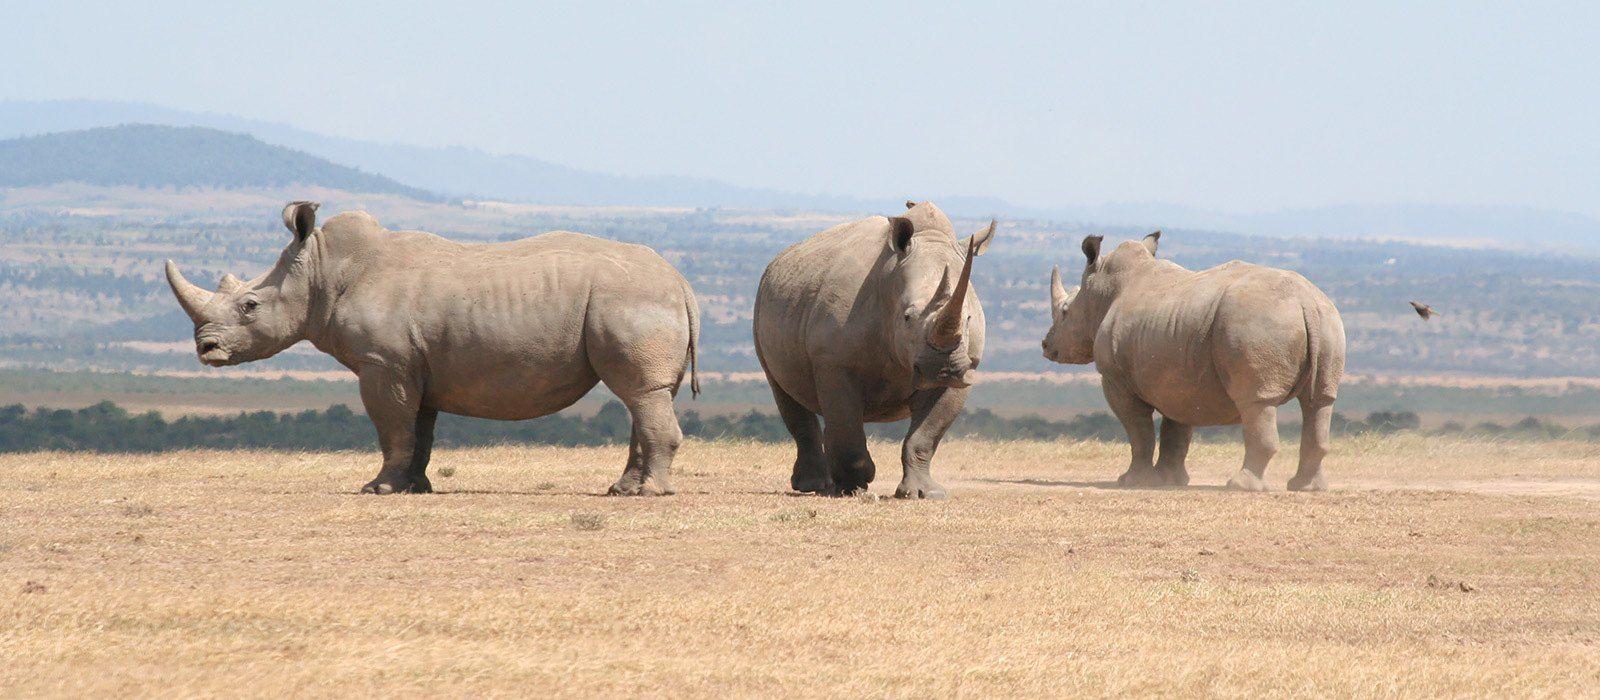 Kenia & Sansibar Reise: Safaris & Strände Urlaub 3